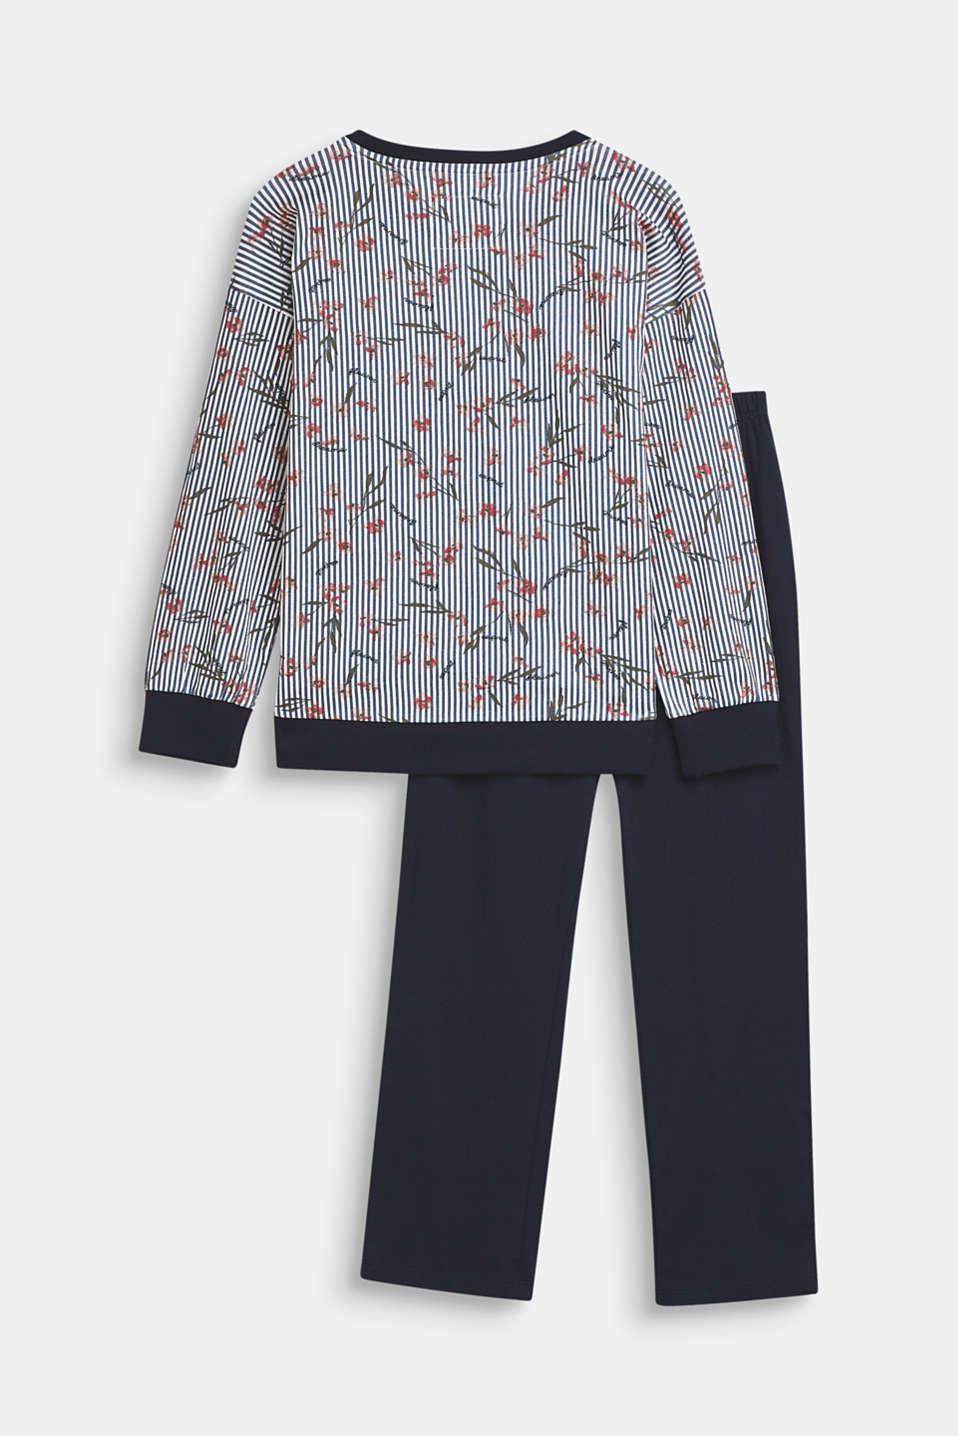 Printed jersey pyjamas, 100% cotton, NAVY, detail image number 1